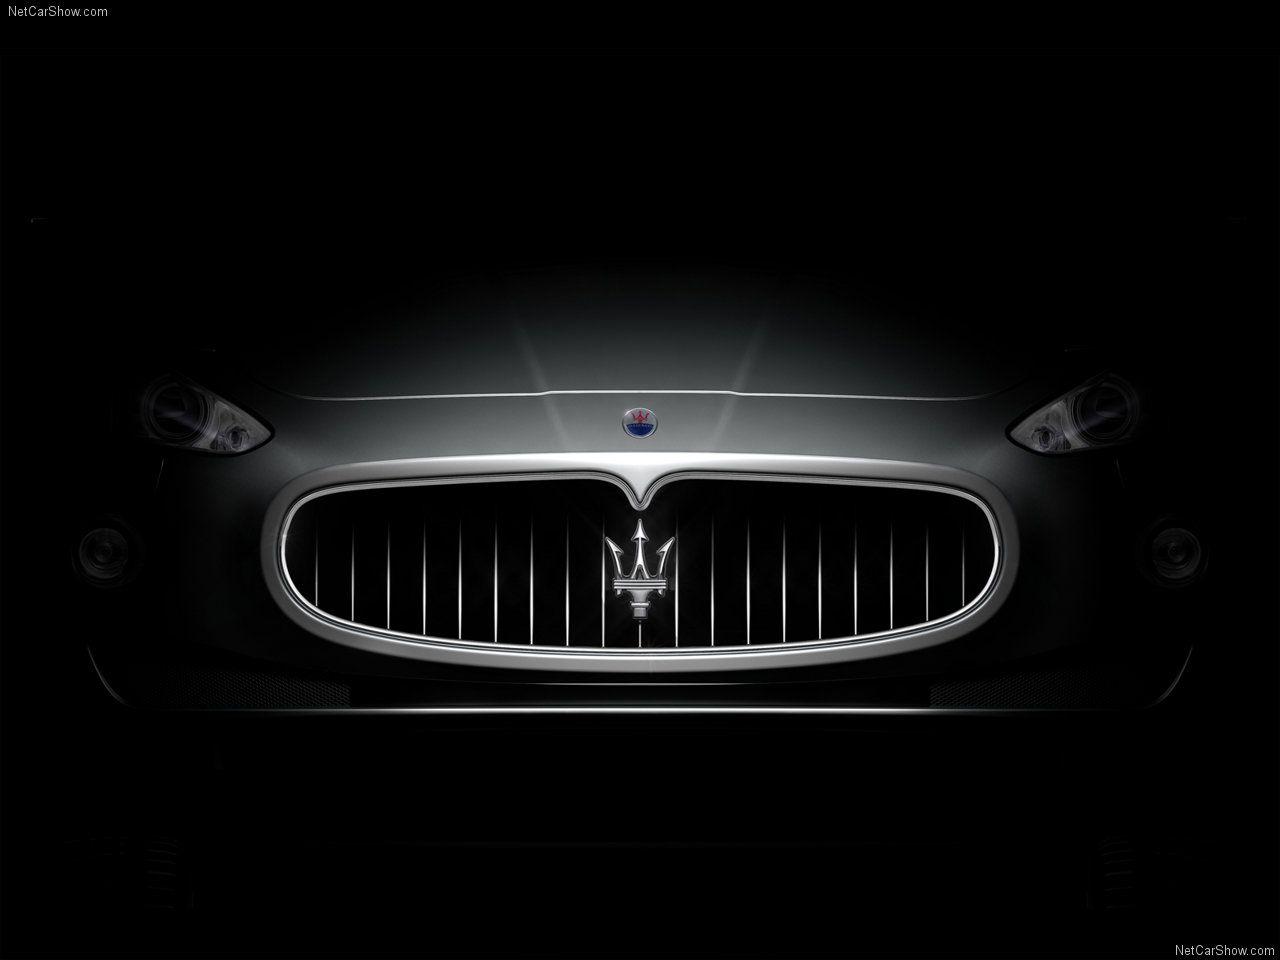 Maserati Logo In Grill Wallpaper HD Desktop